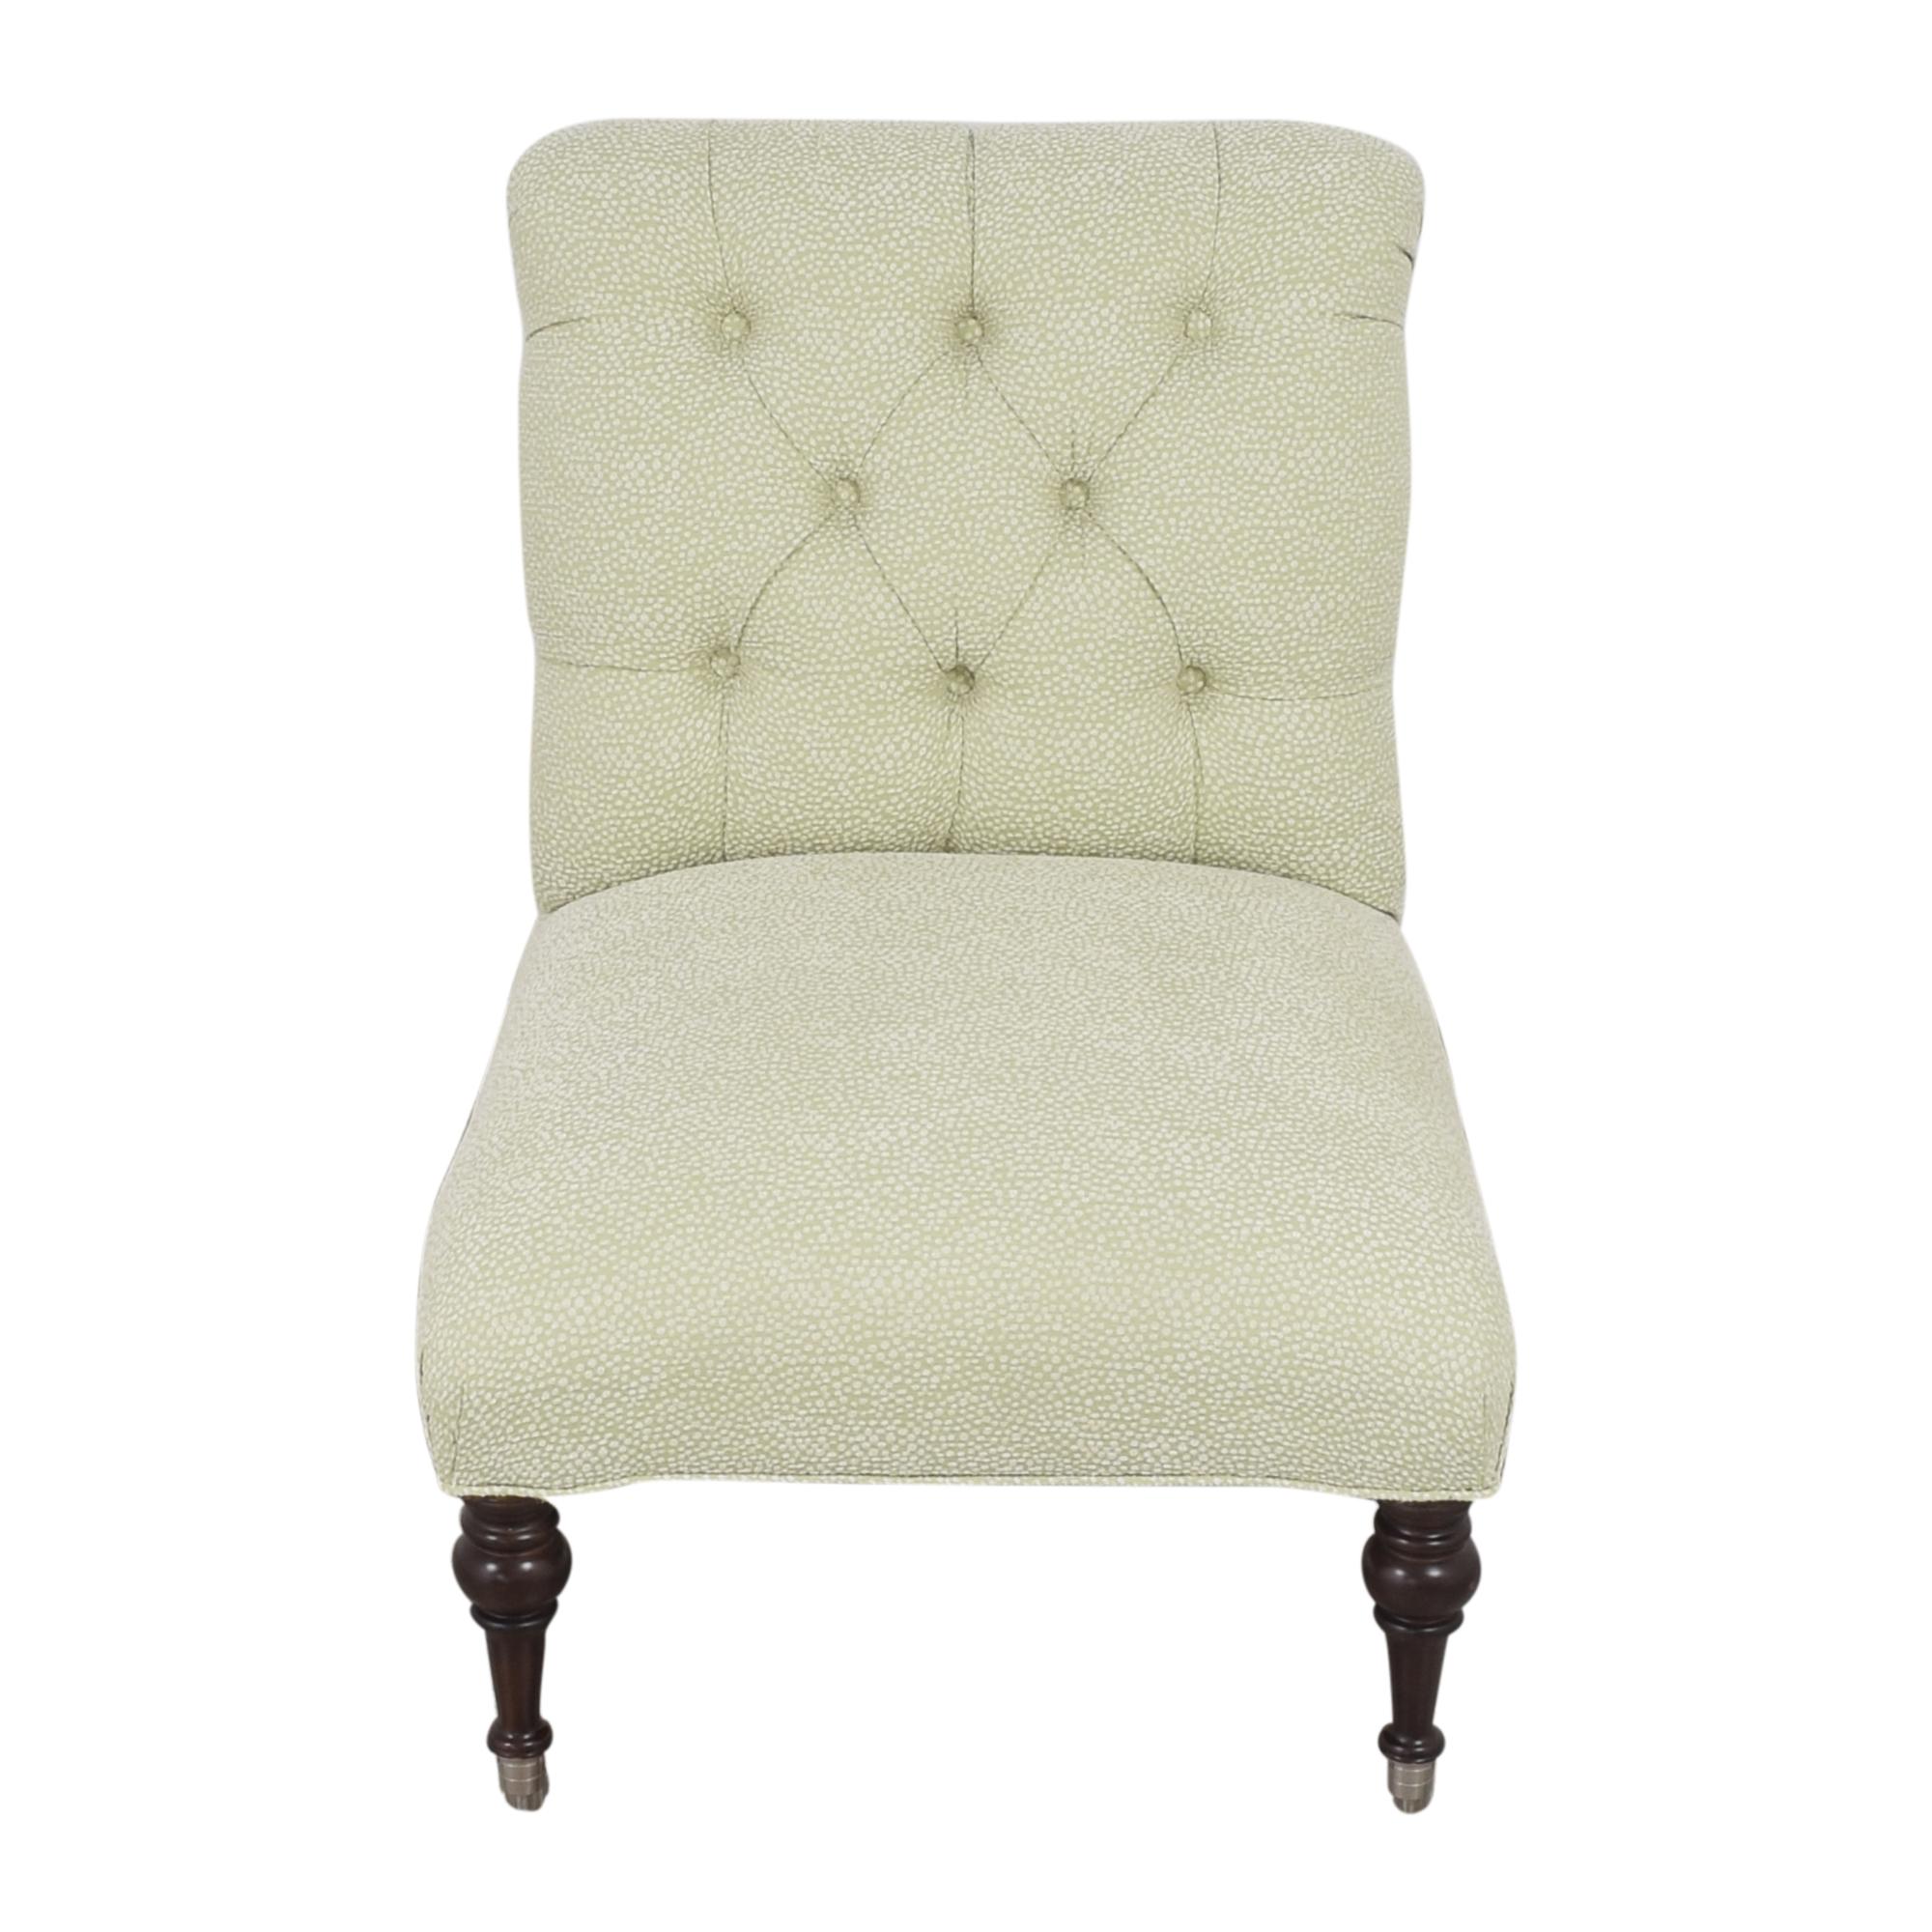 Tufted Slipper Chair sale